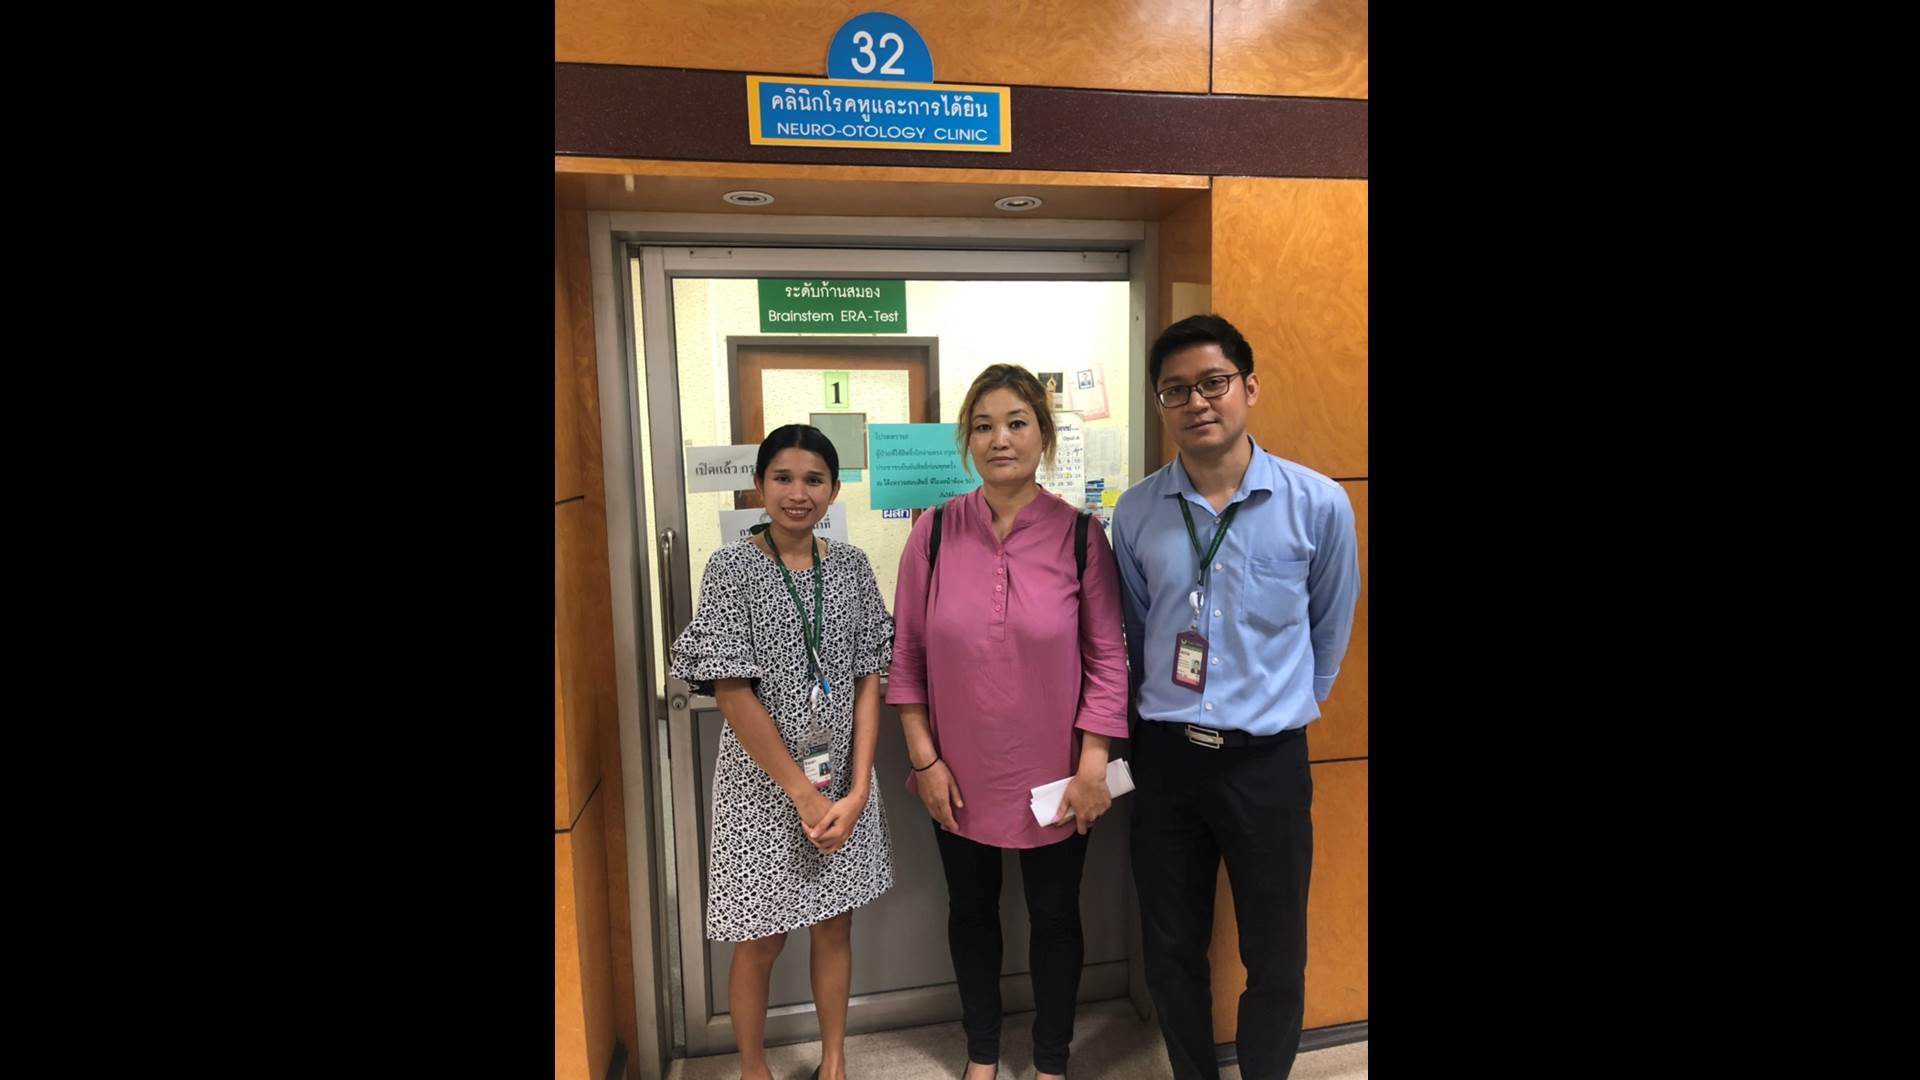 Bhutanese Nurse Attended the Short-Training Program in Audiology at Siriraj